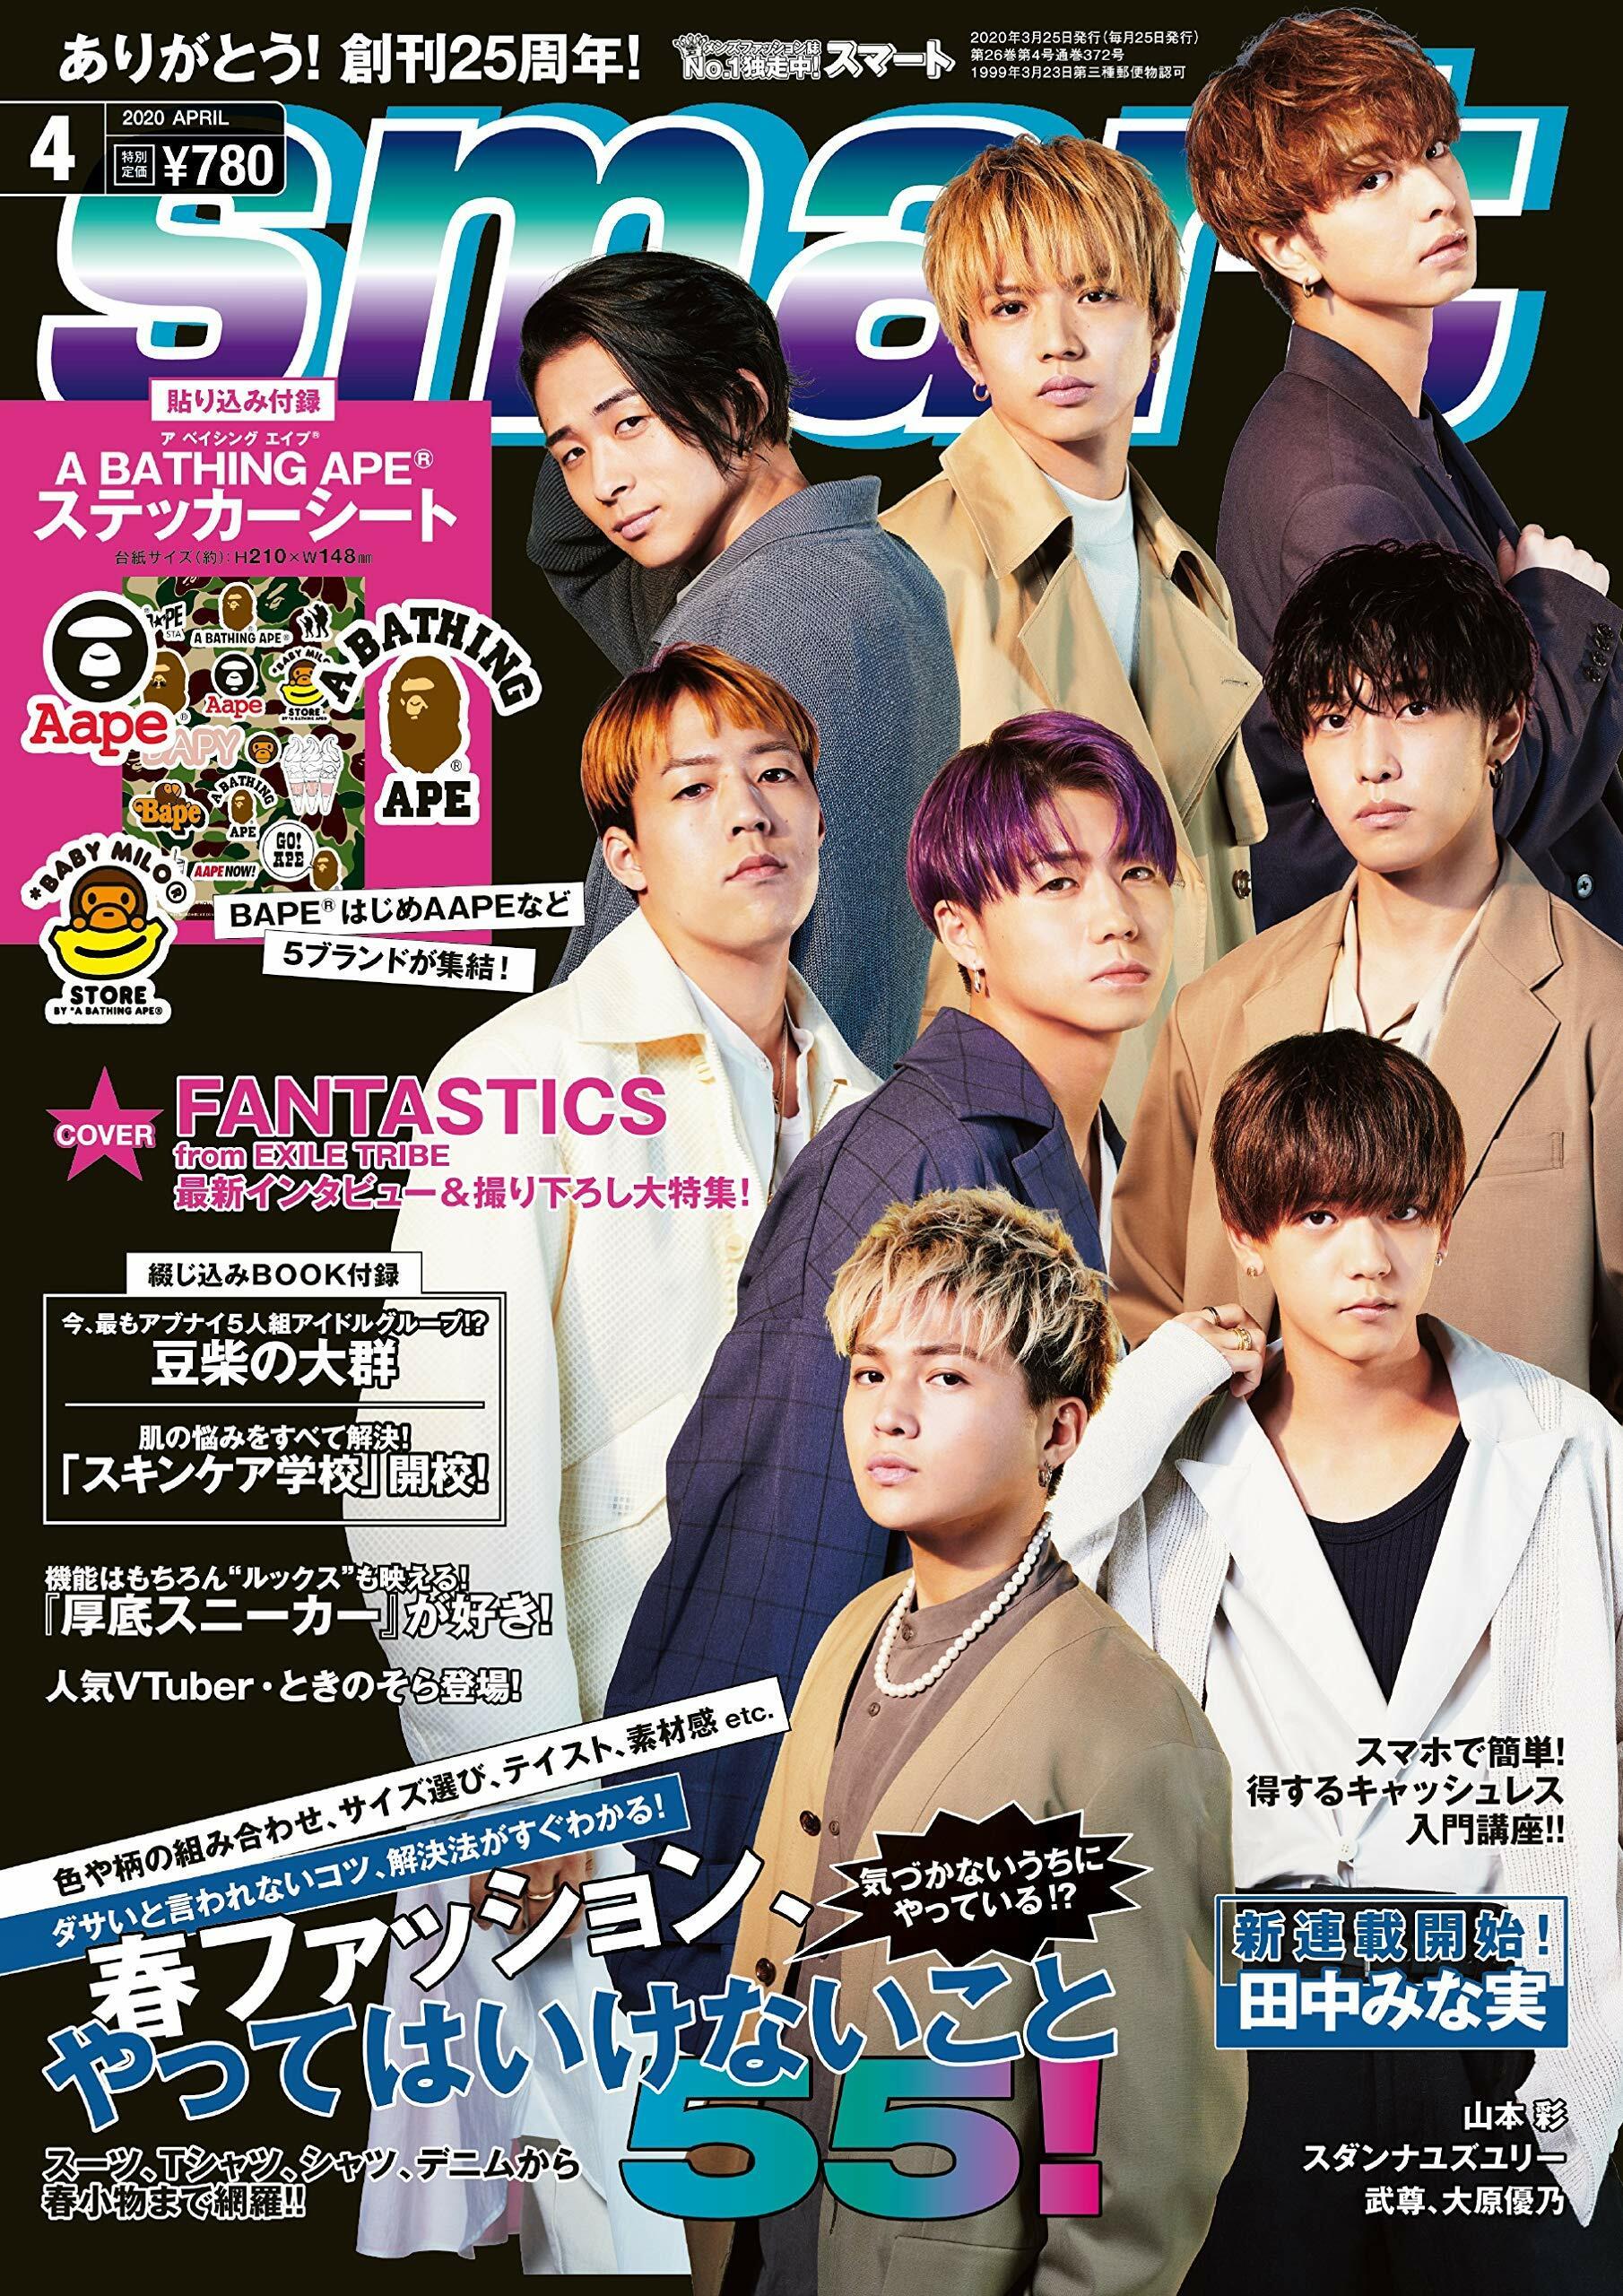 smart (スマ-ト) 2020年 04月號 (雜誌, 月刊)